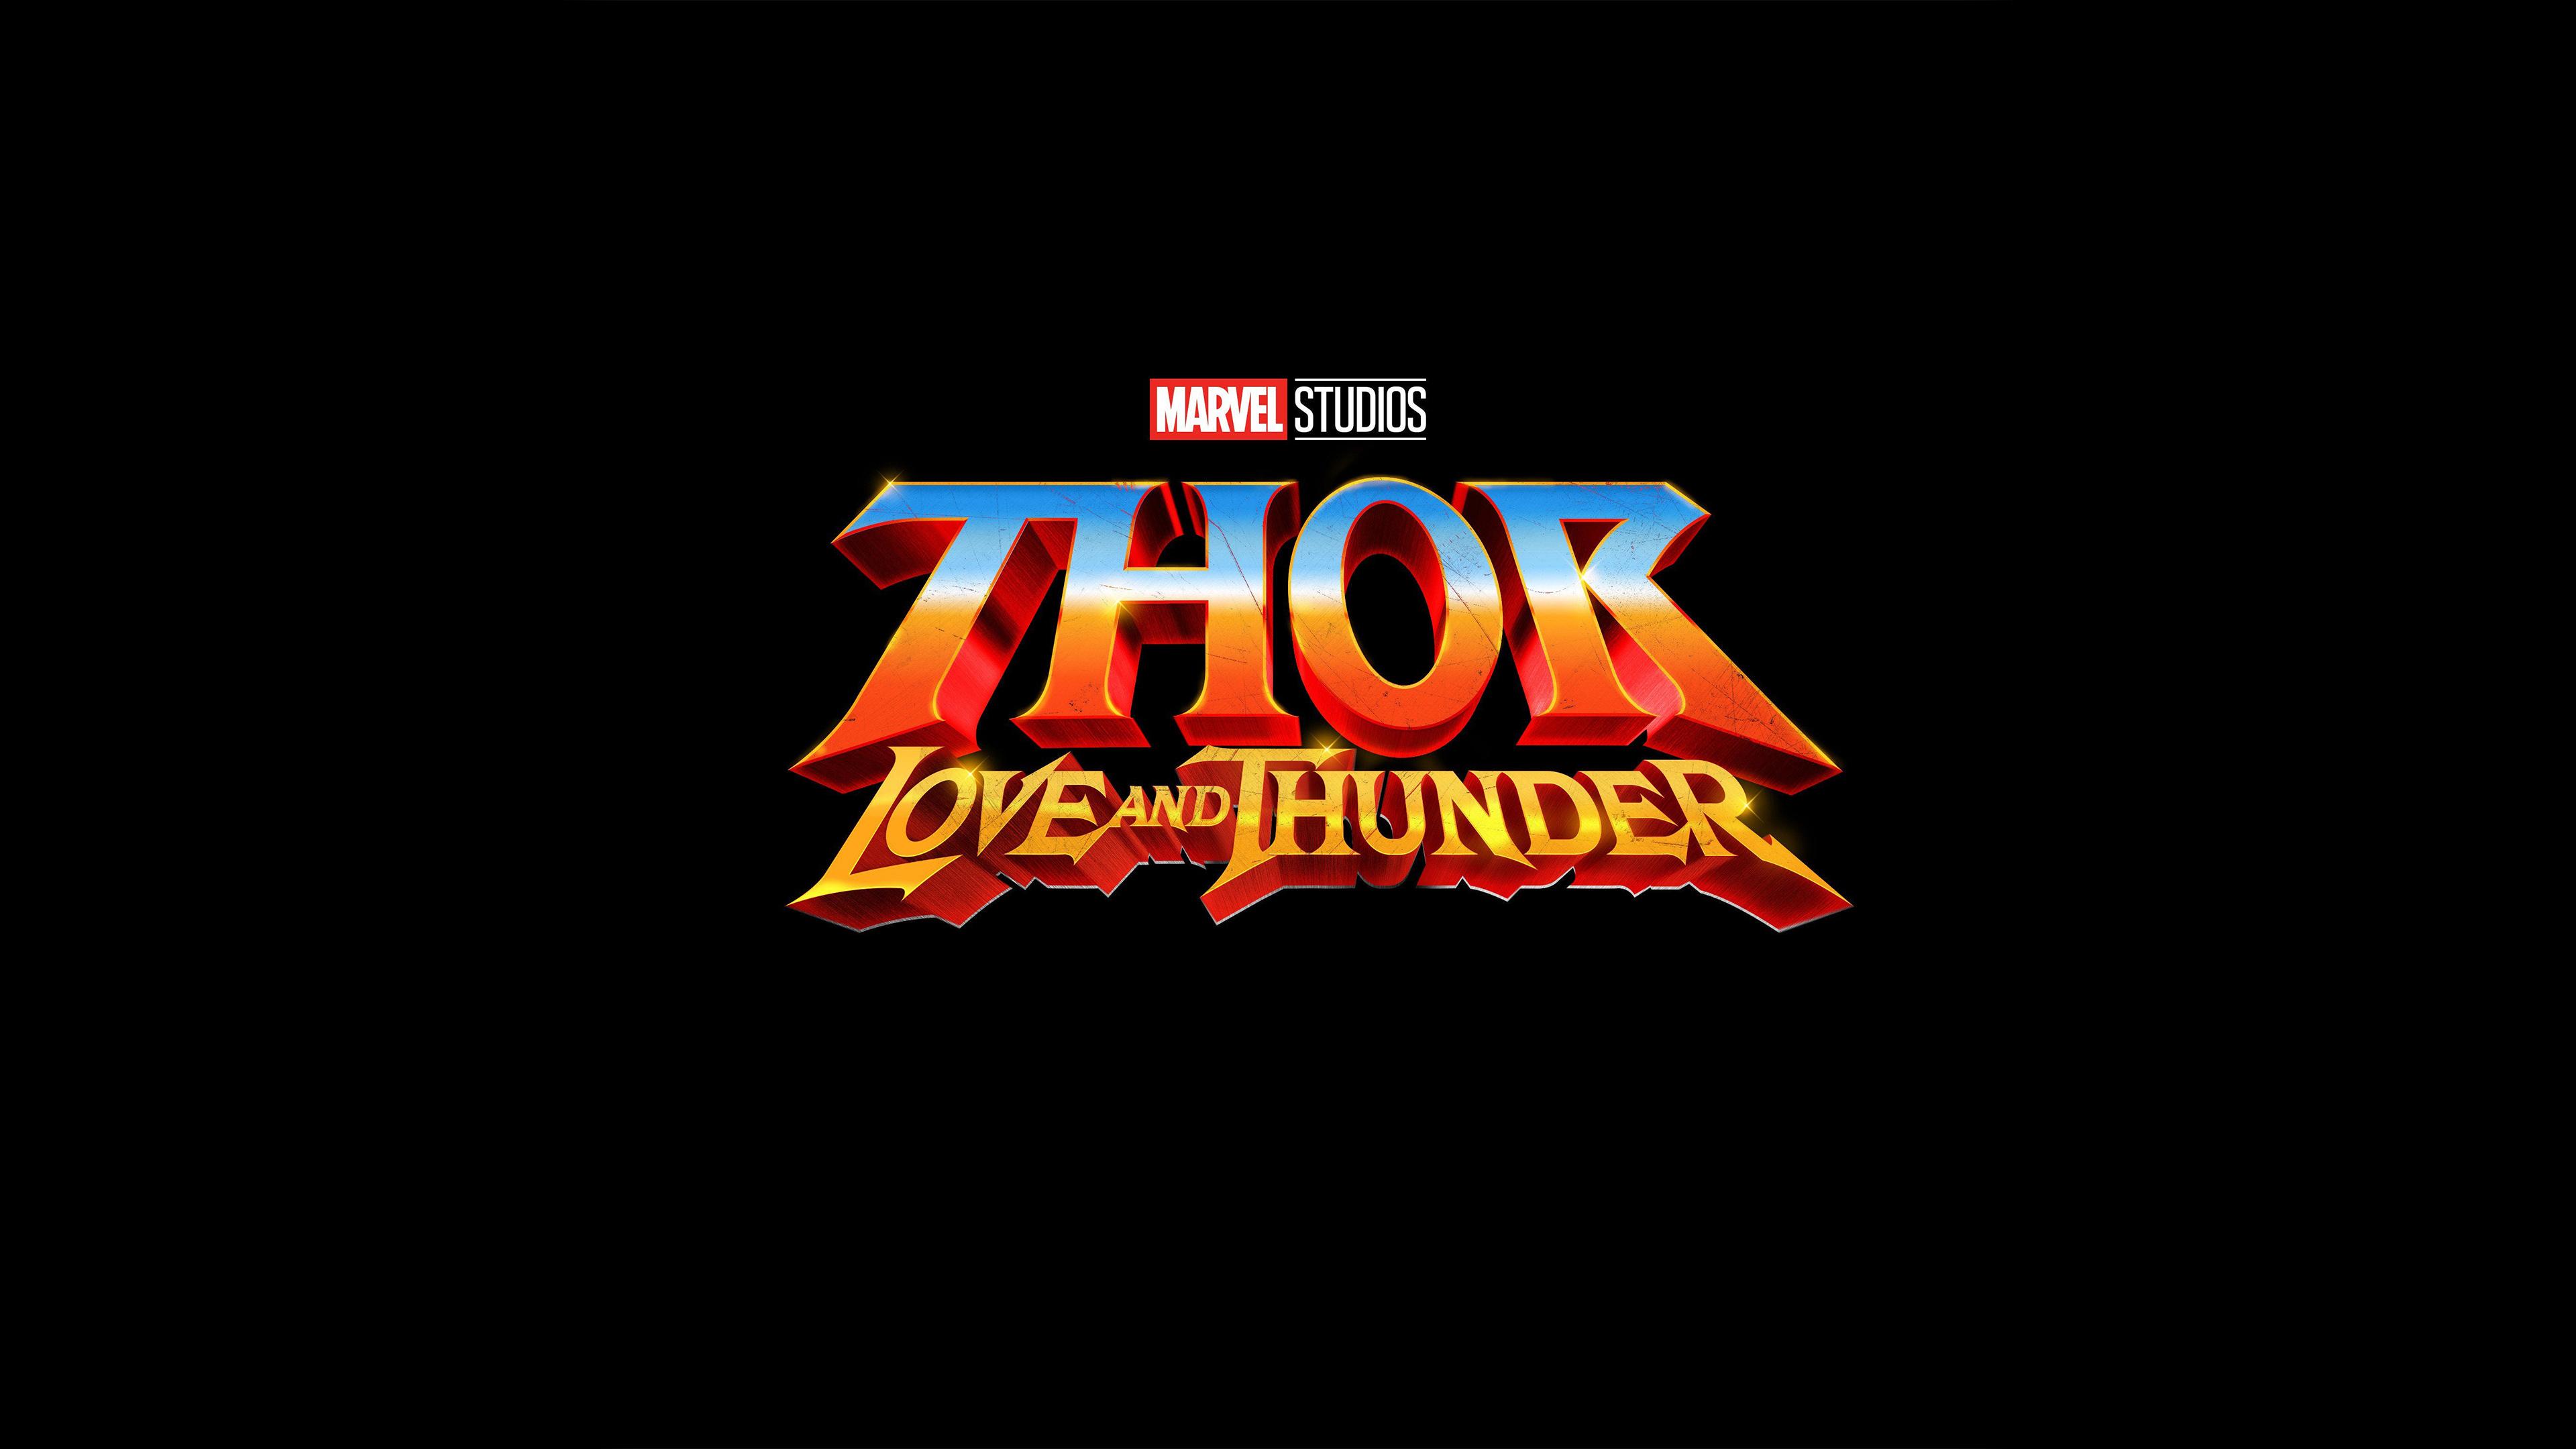 thor love and thunder 2021 1565055664 - Thor Love And Thunder 2021 - thor wallpapers, thor love and thunder wallpapers, movies wallpapers, hd-wallpapers, 4k-wallpapers, 2021 movies wallpapers